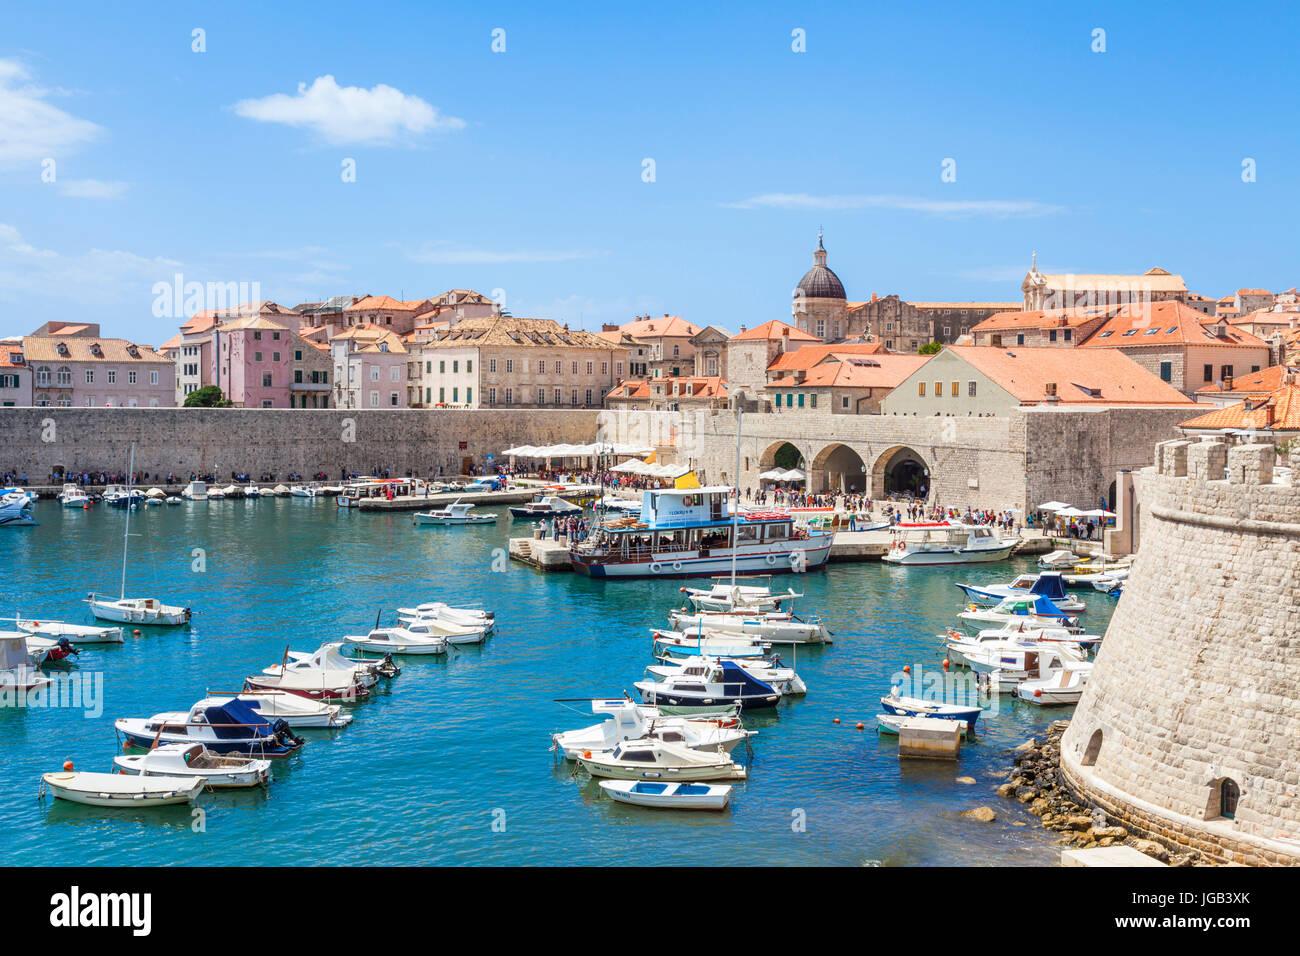 Croatia Dubrovnik Croatia Dalmatian coast Dubrovnik old Town old port porporela waterfront Dubrovnik harbour yachts - Stock Image